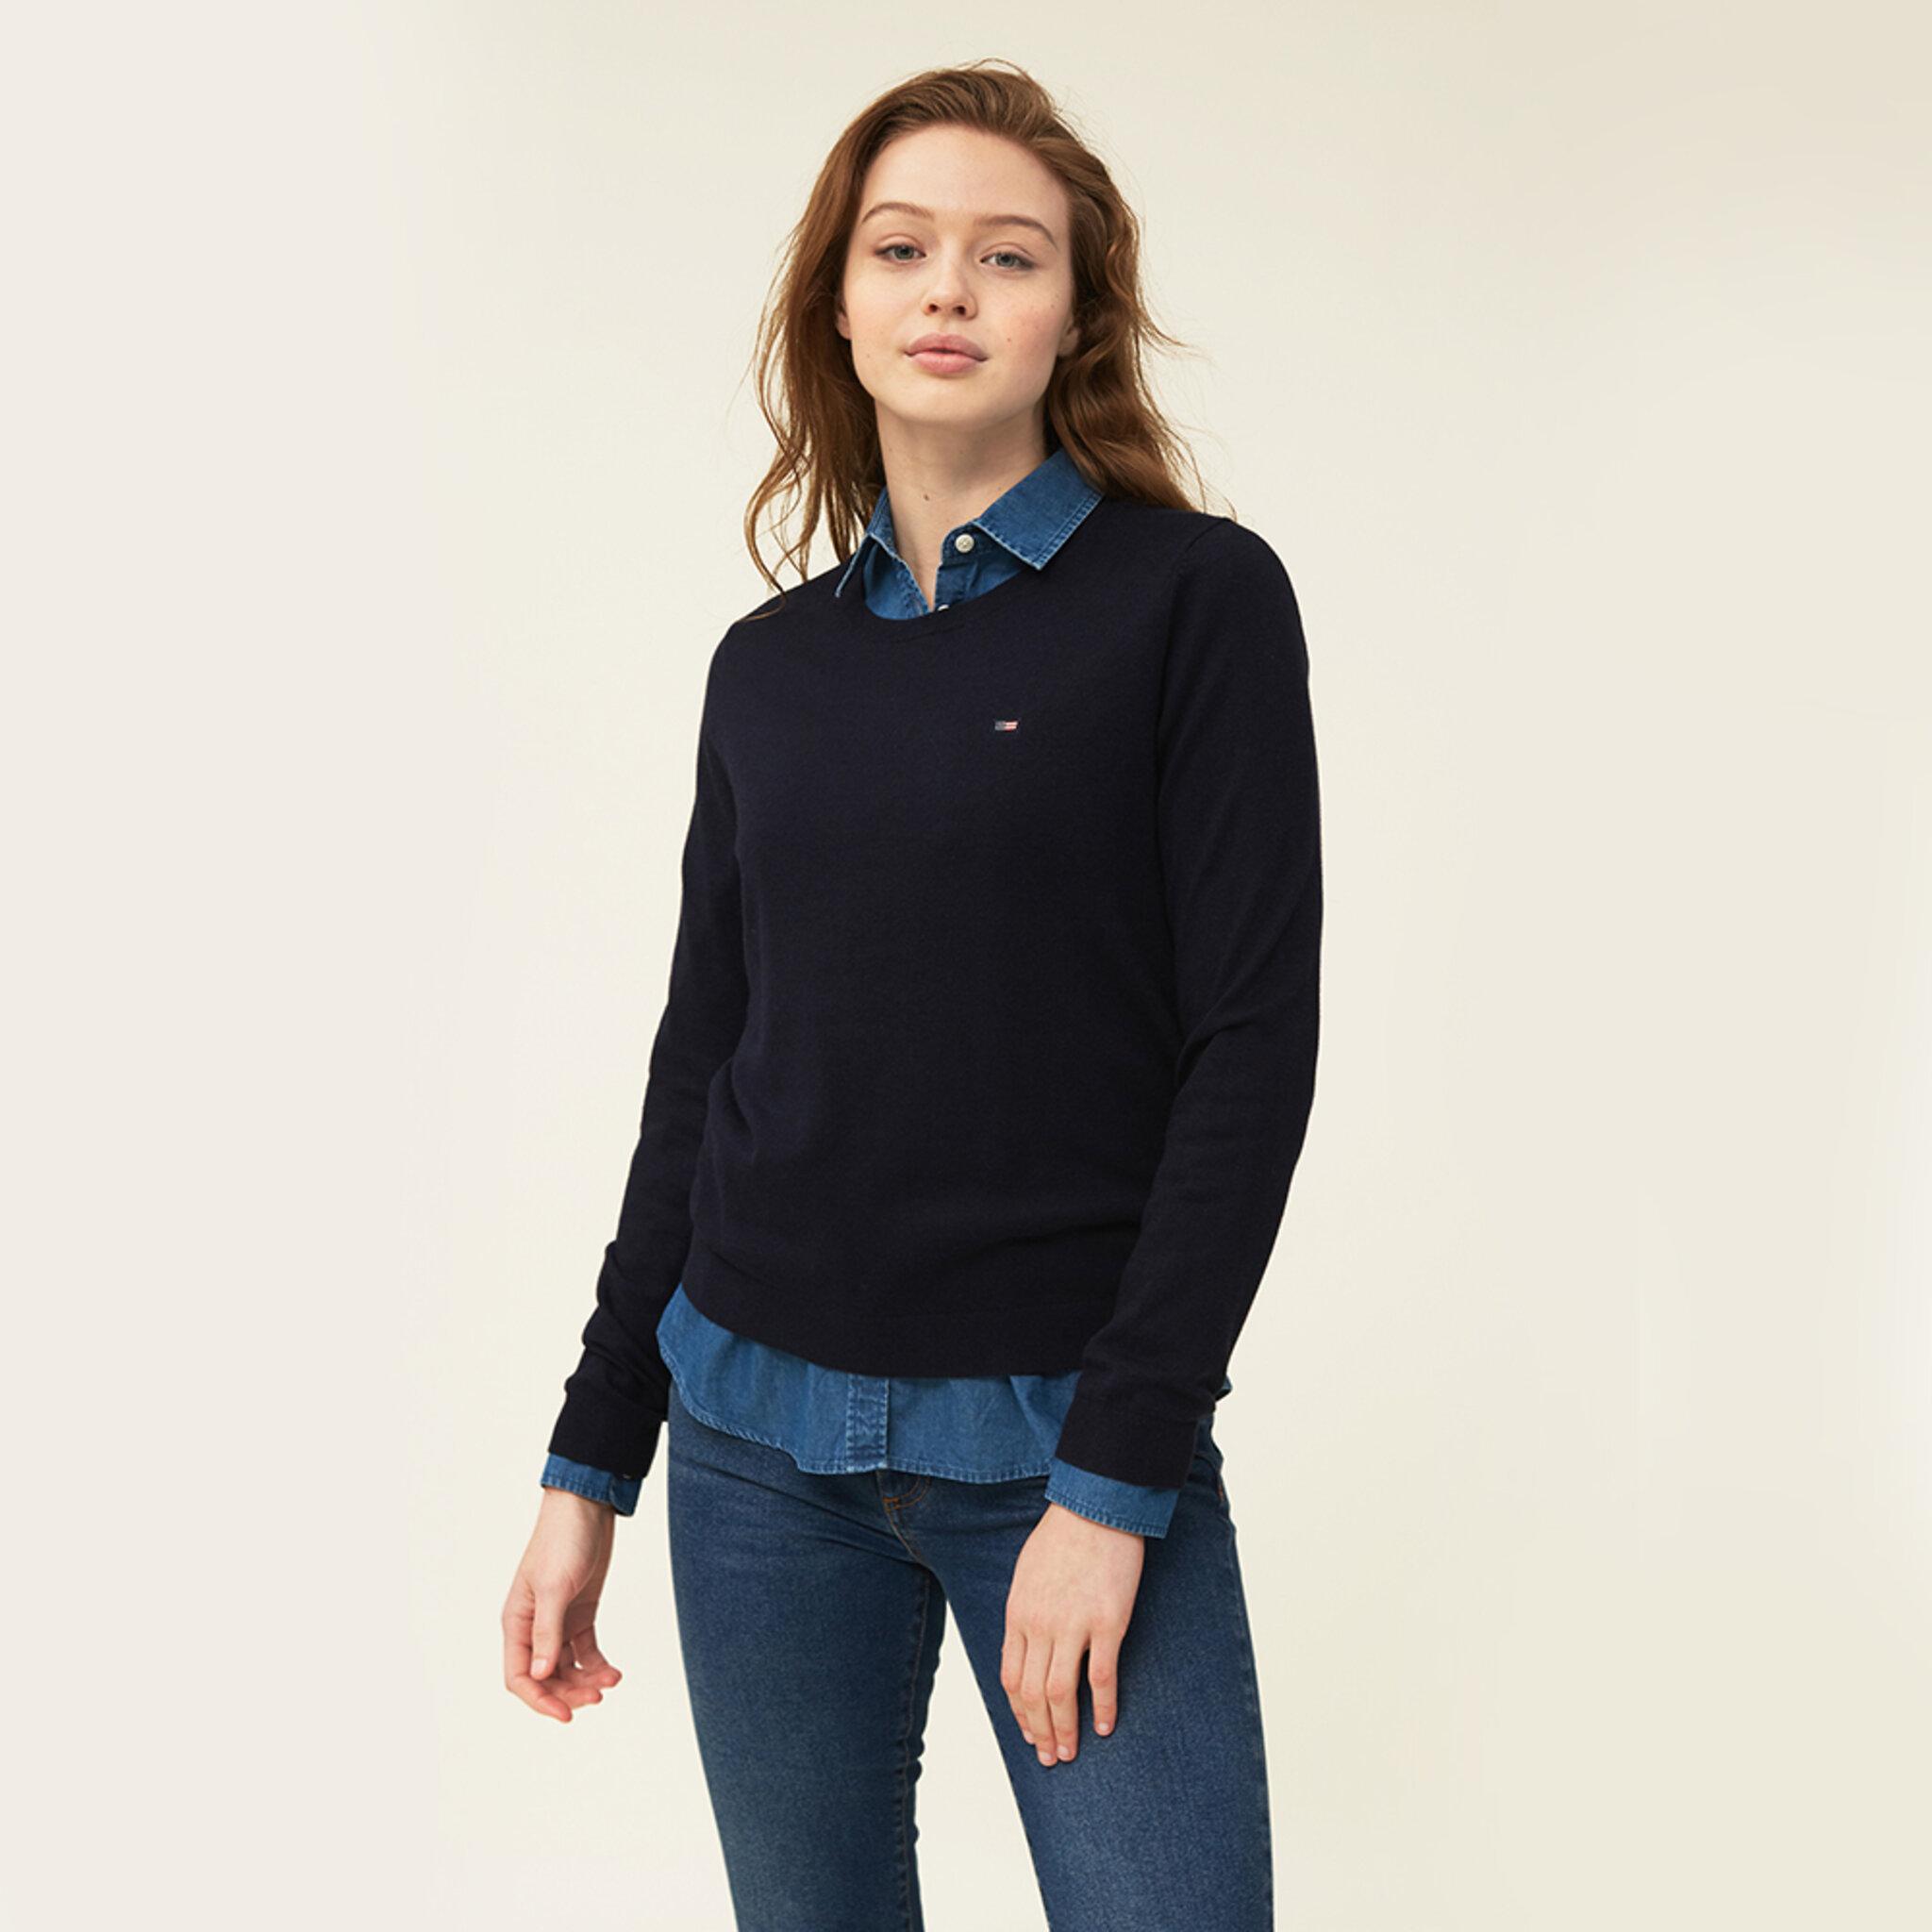 Marline Organic Cotton Sweater